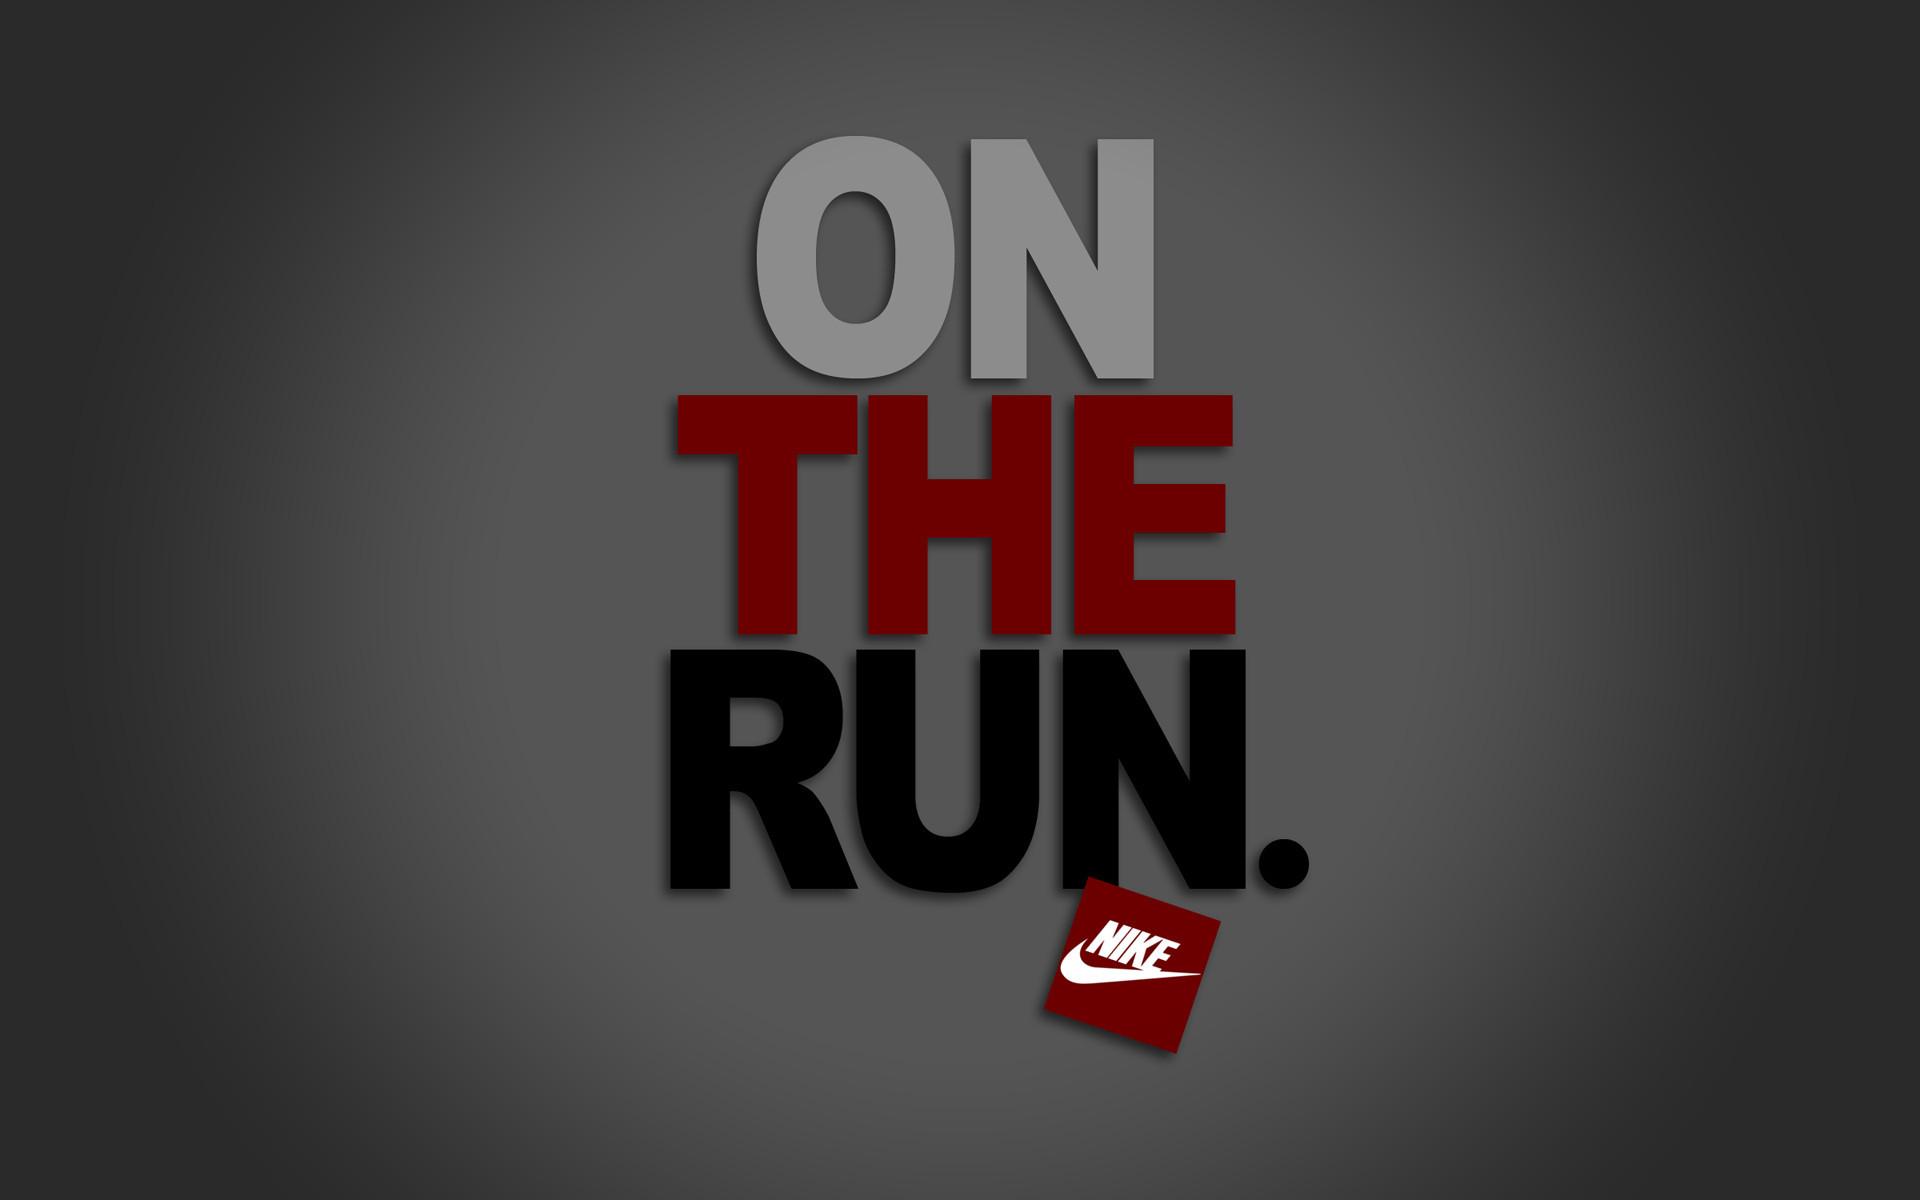 Nike On The Run HD Desktop Mobile Wallpaper Background   9walls 1920x1200